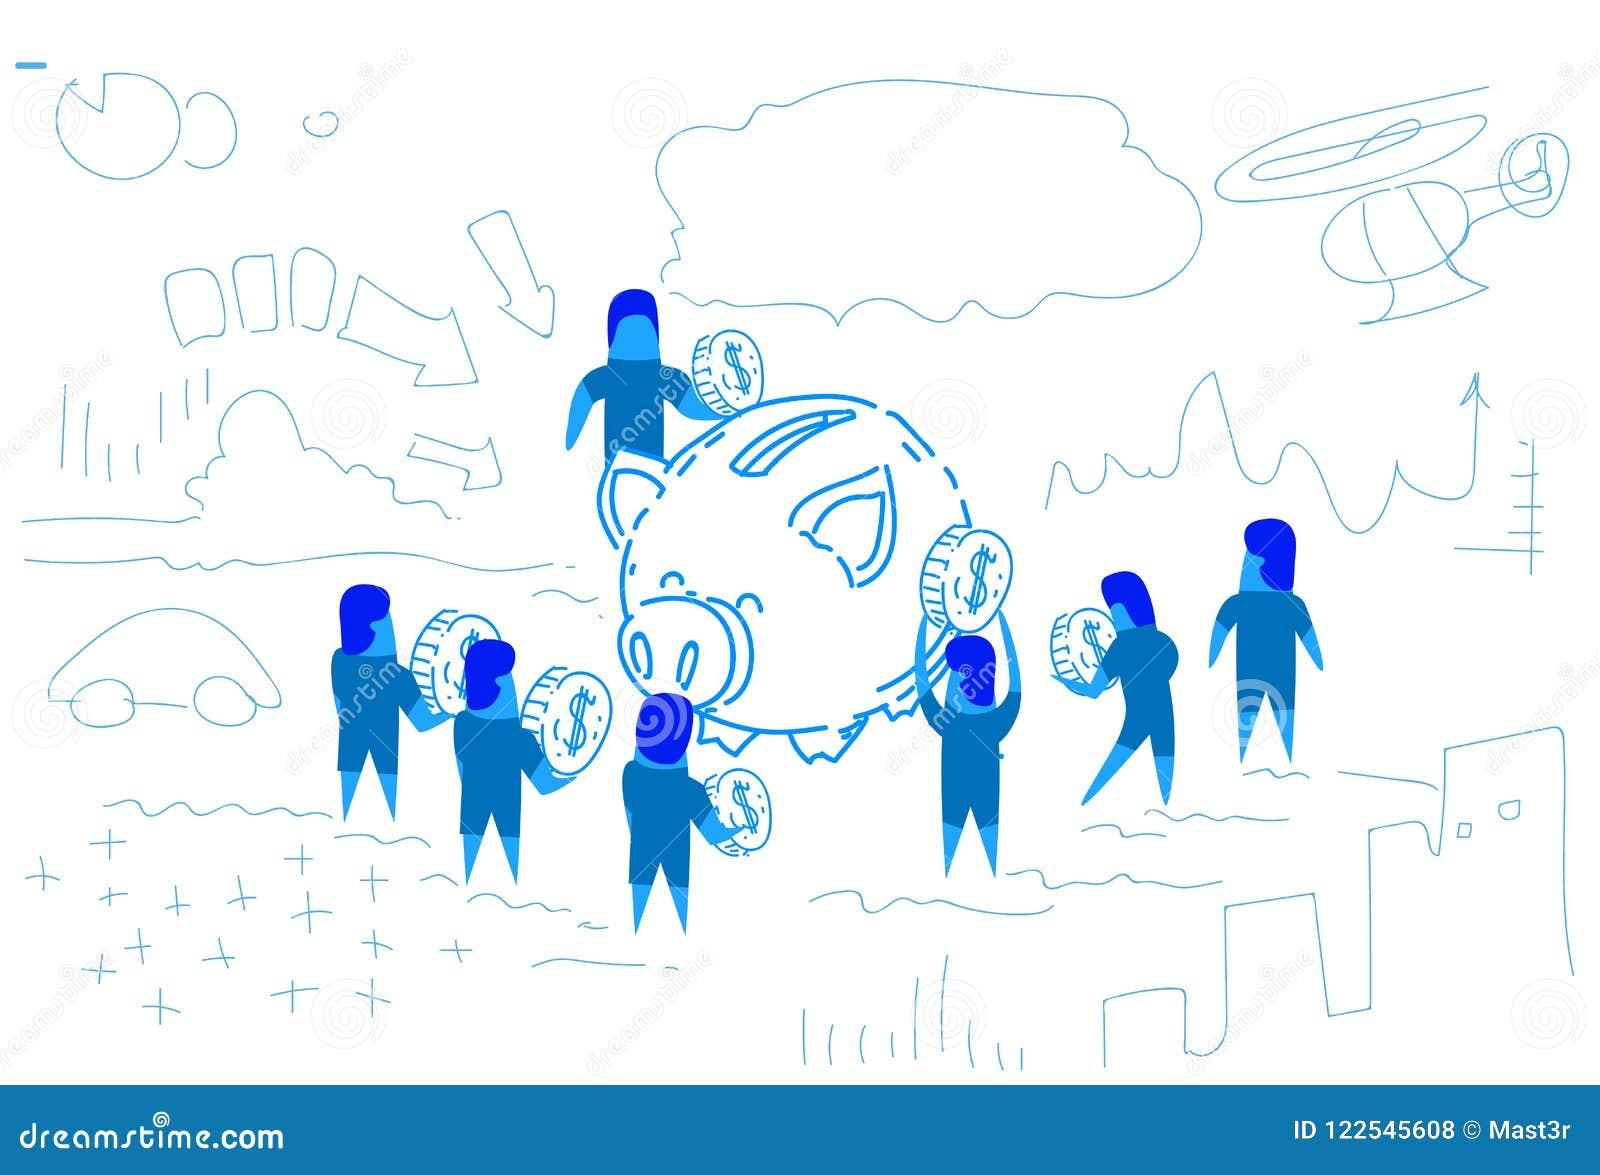 Piggy box businessman put dollar coin money growth wealth concept strategy people group brainstorming teamwork success